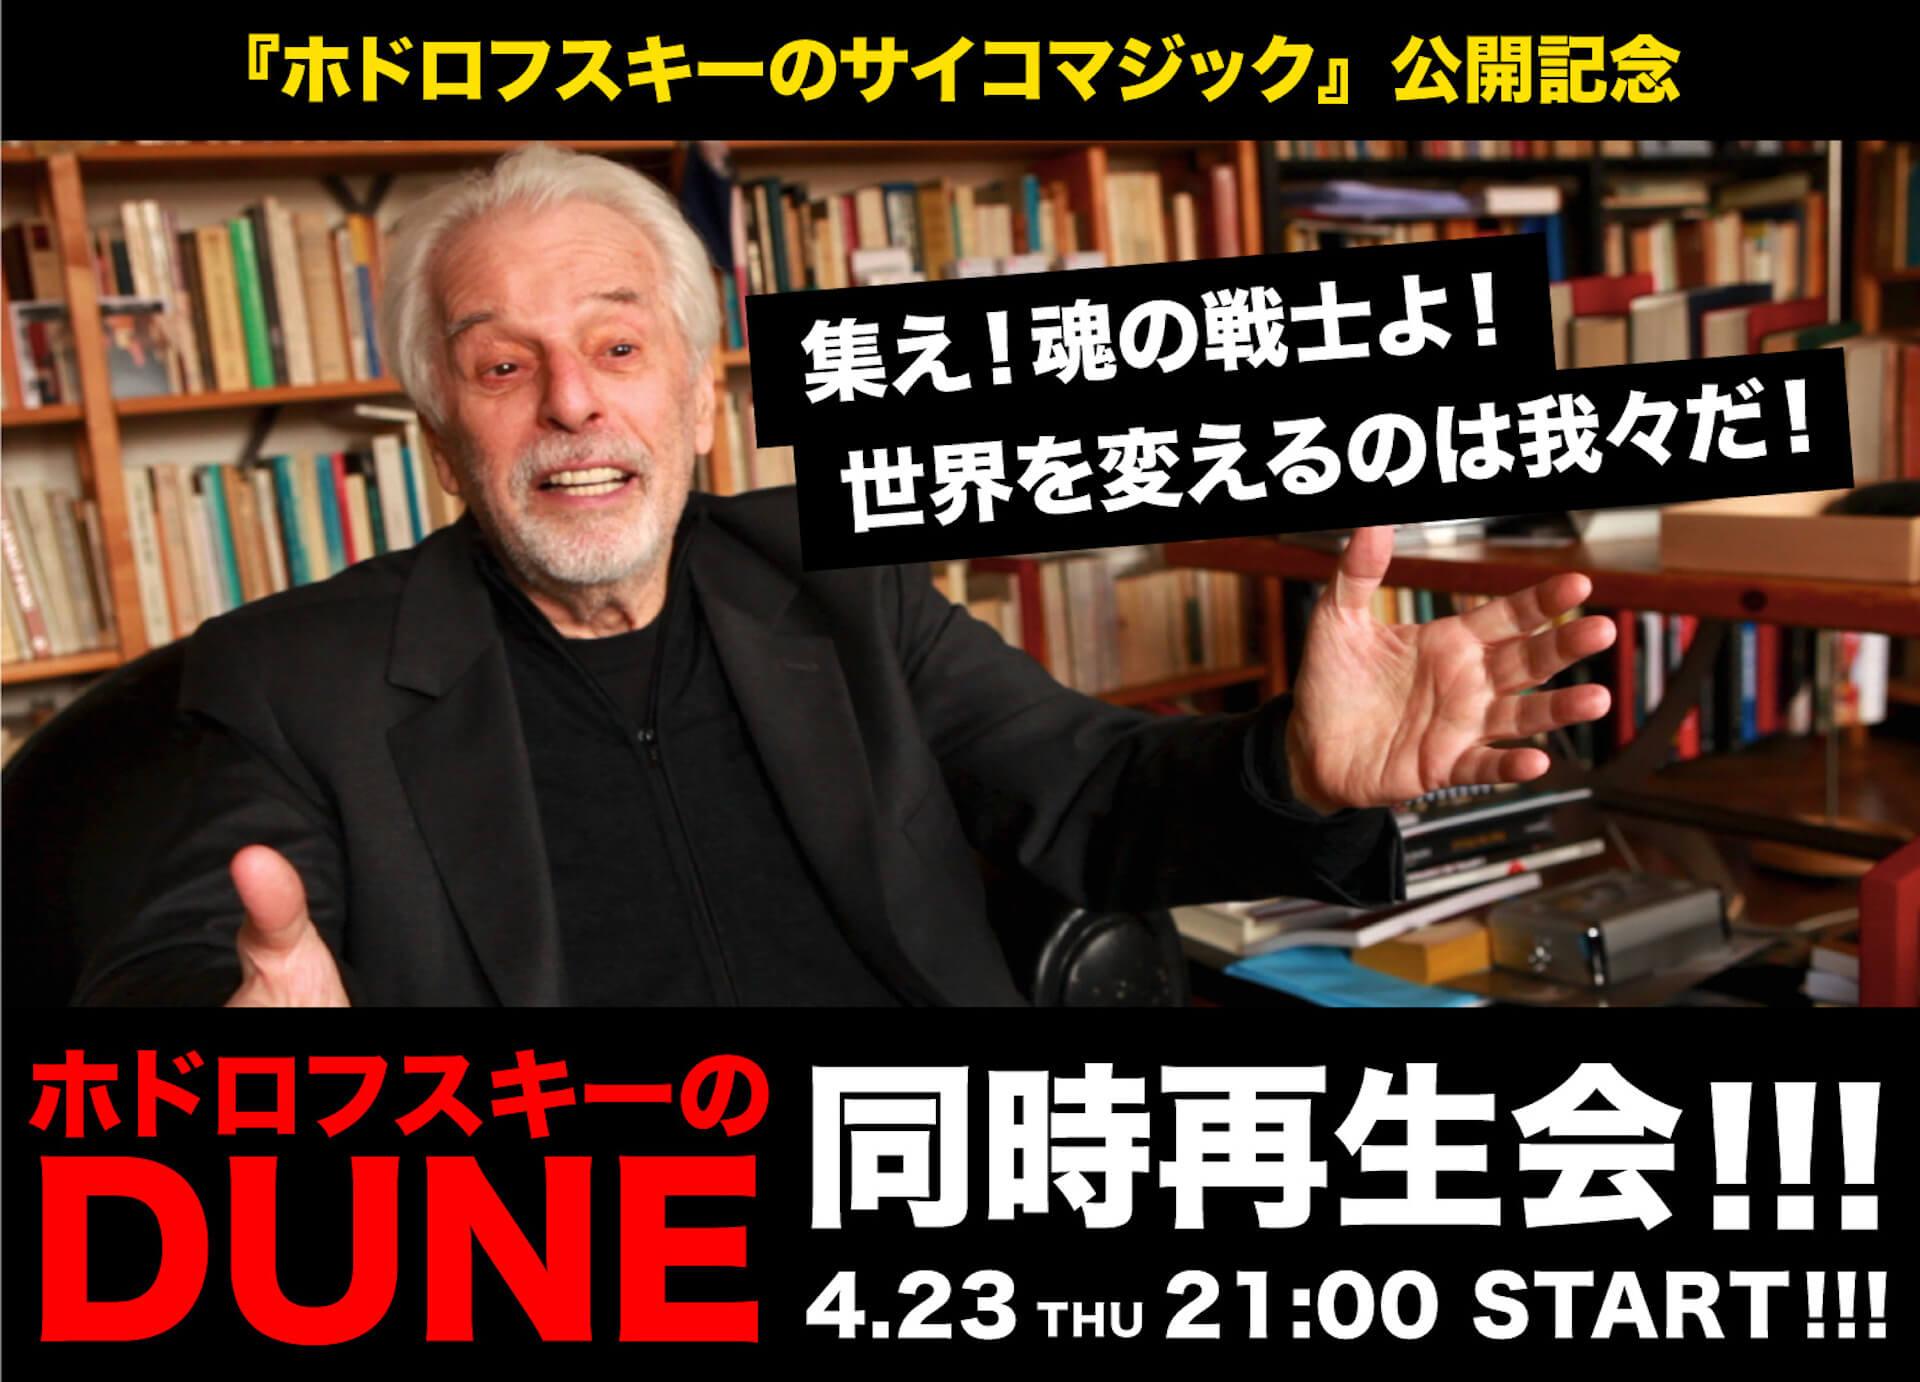 UPKINKが映画『ホドロフスキーのサイコマジック』先行配信を記念して、『ホドロフスキーのDUNE』同時再生会を開催! film200422_uplink_dune_01